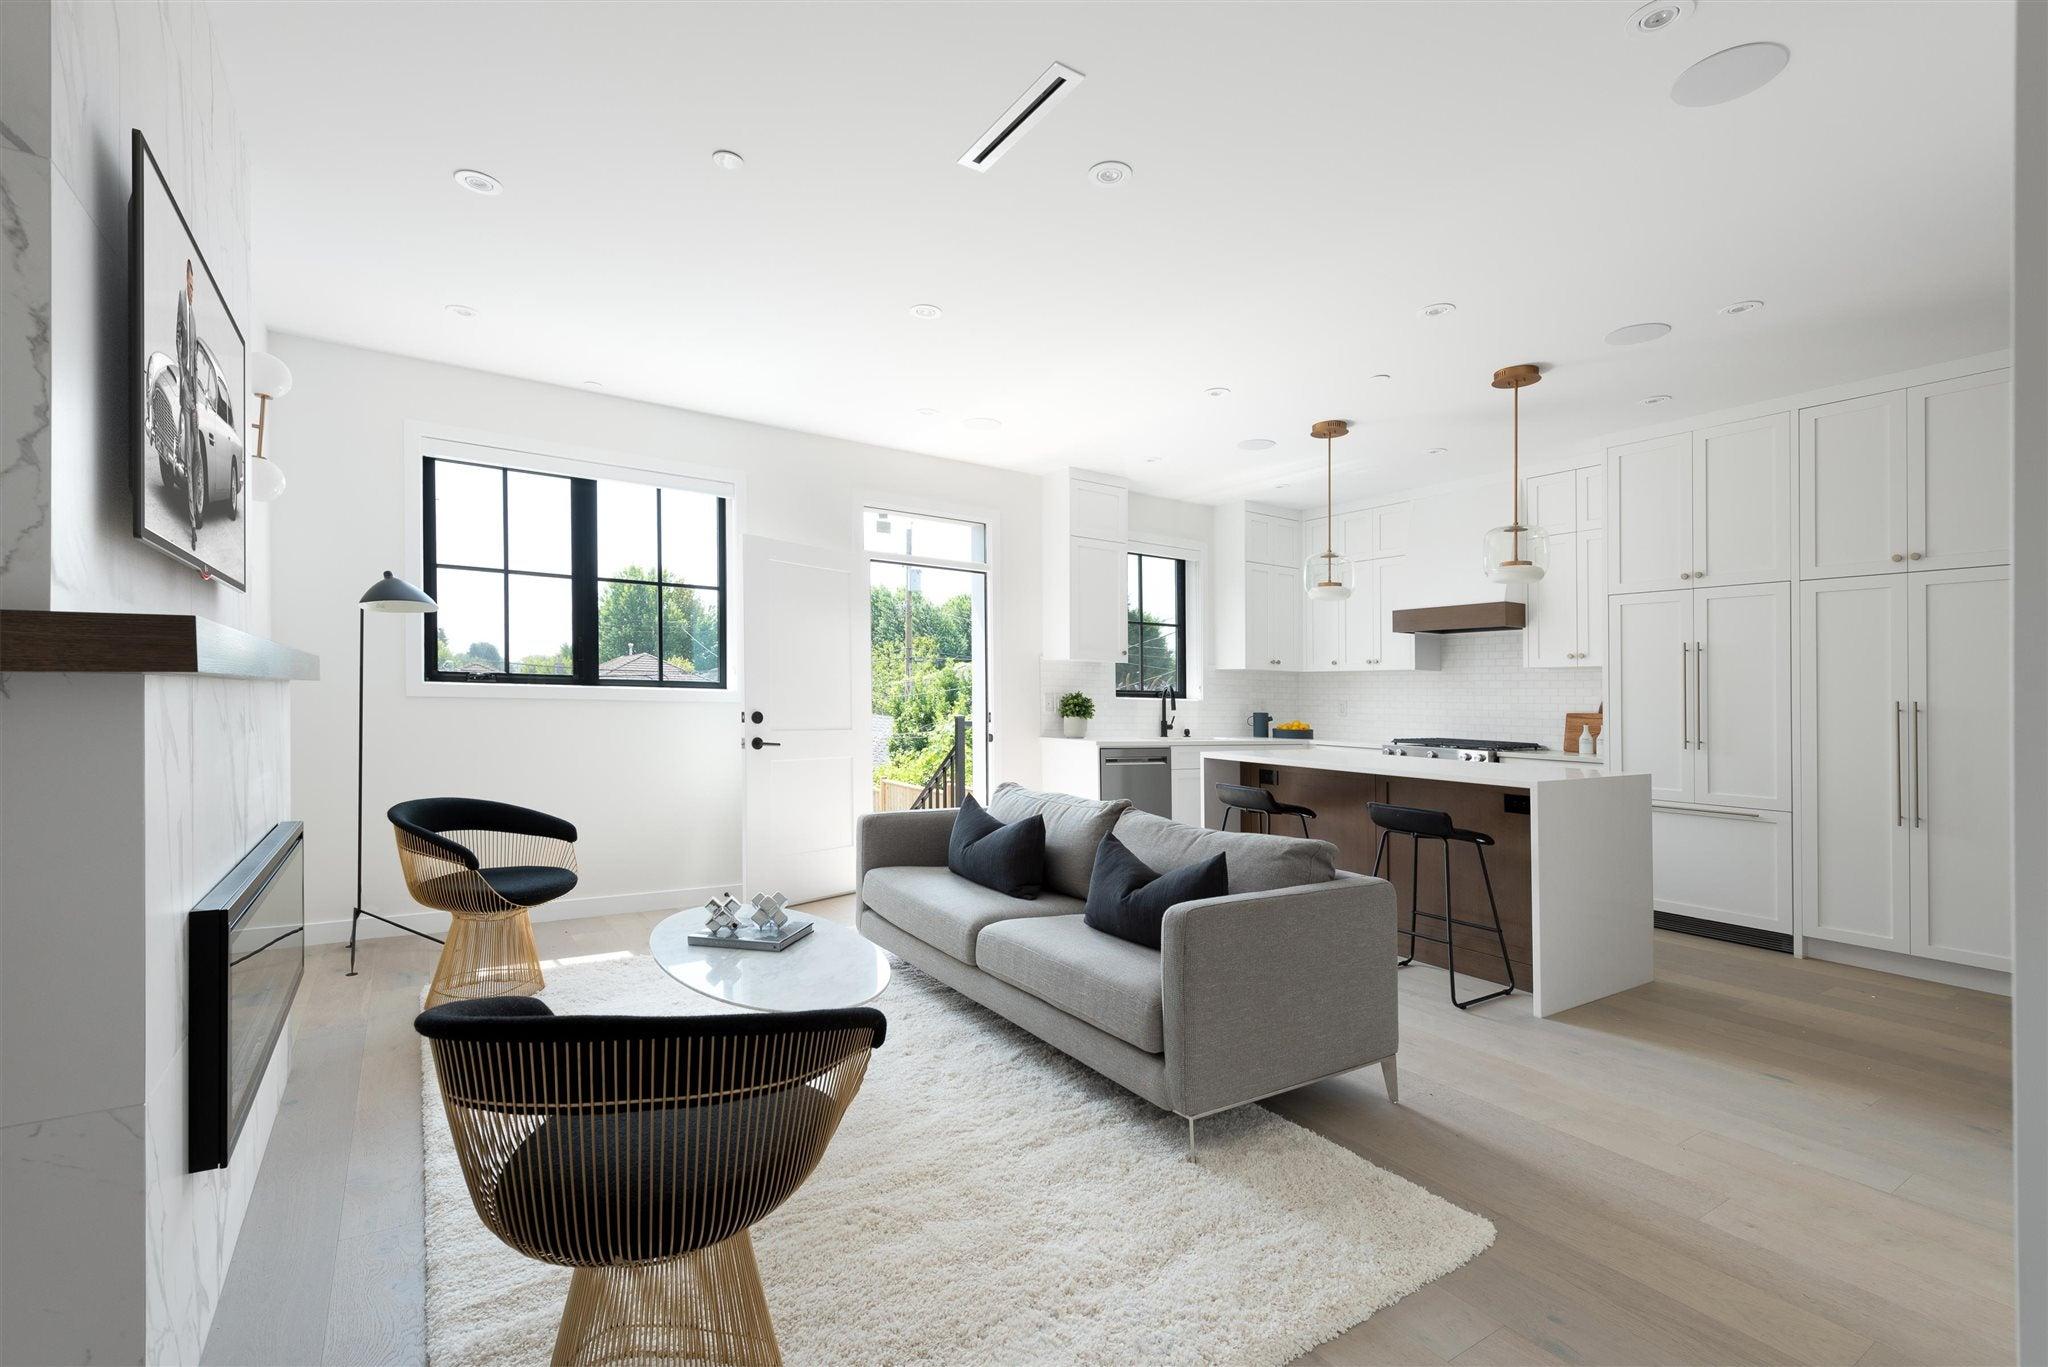 2478 E PENDER STREET - Renfrew VE 1/2 Duplex for sale, 4 Bedrooms (R2607056) - #1